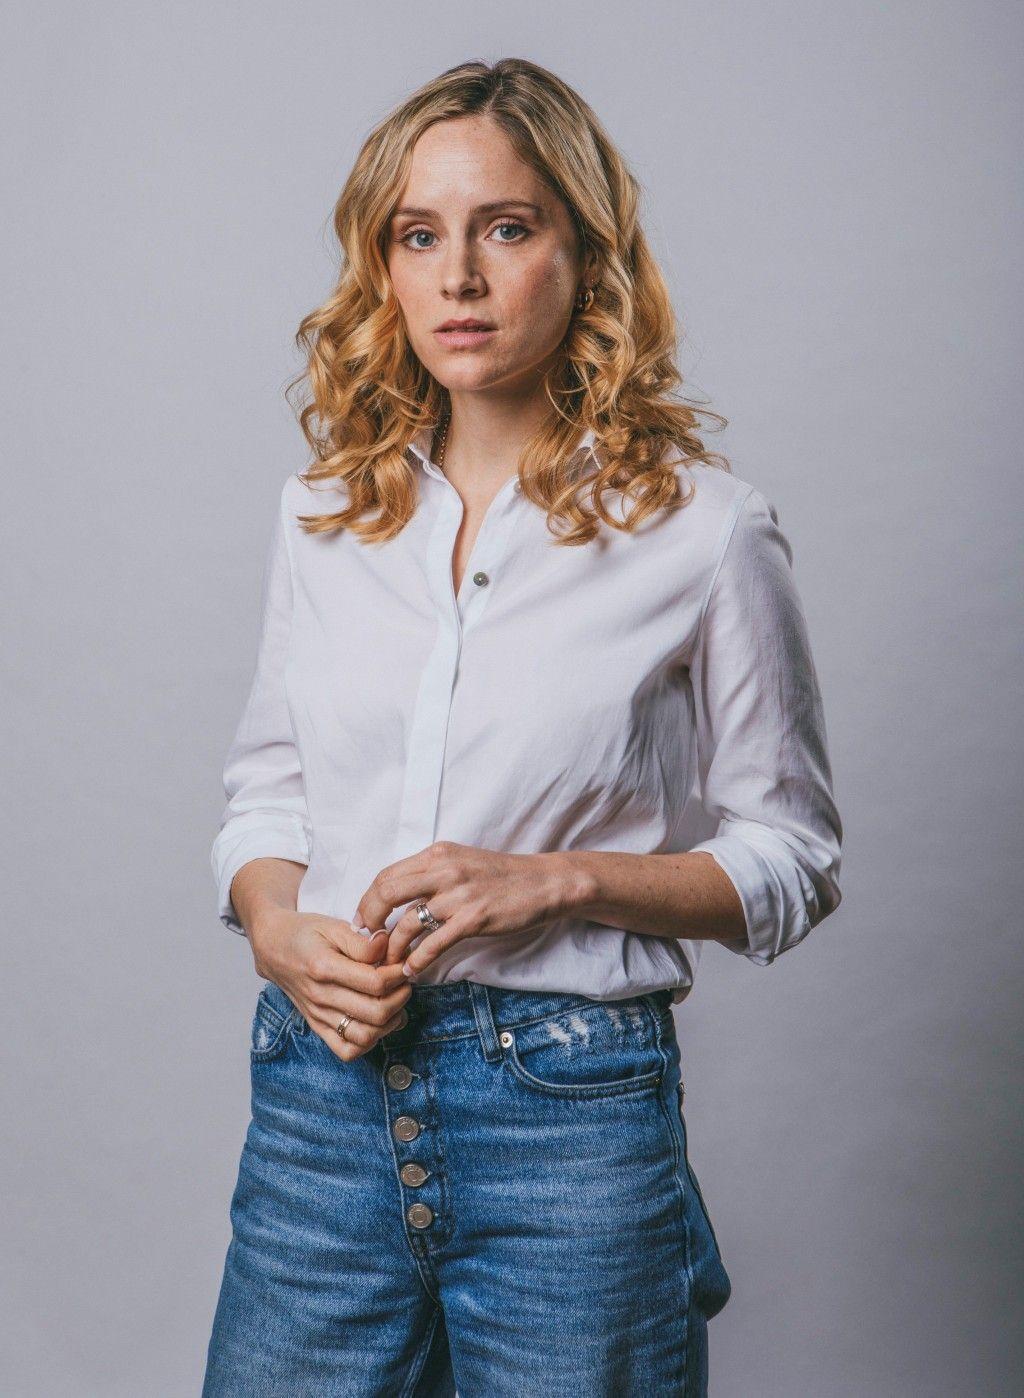 Episodes S02E06 (2012) Sophie Rundle - Free MILF Porn